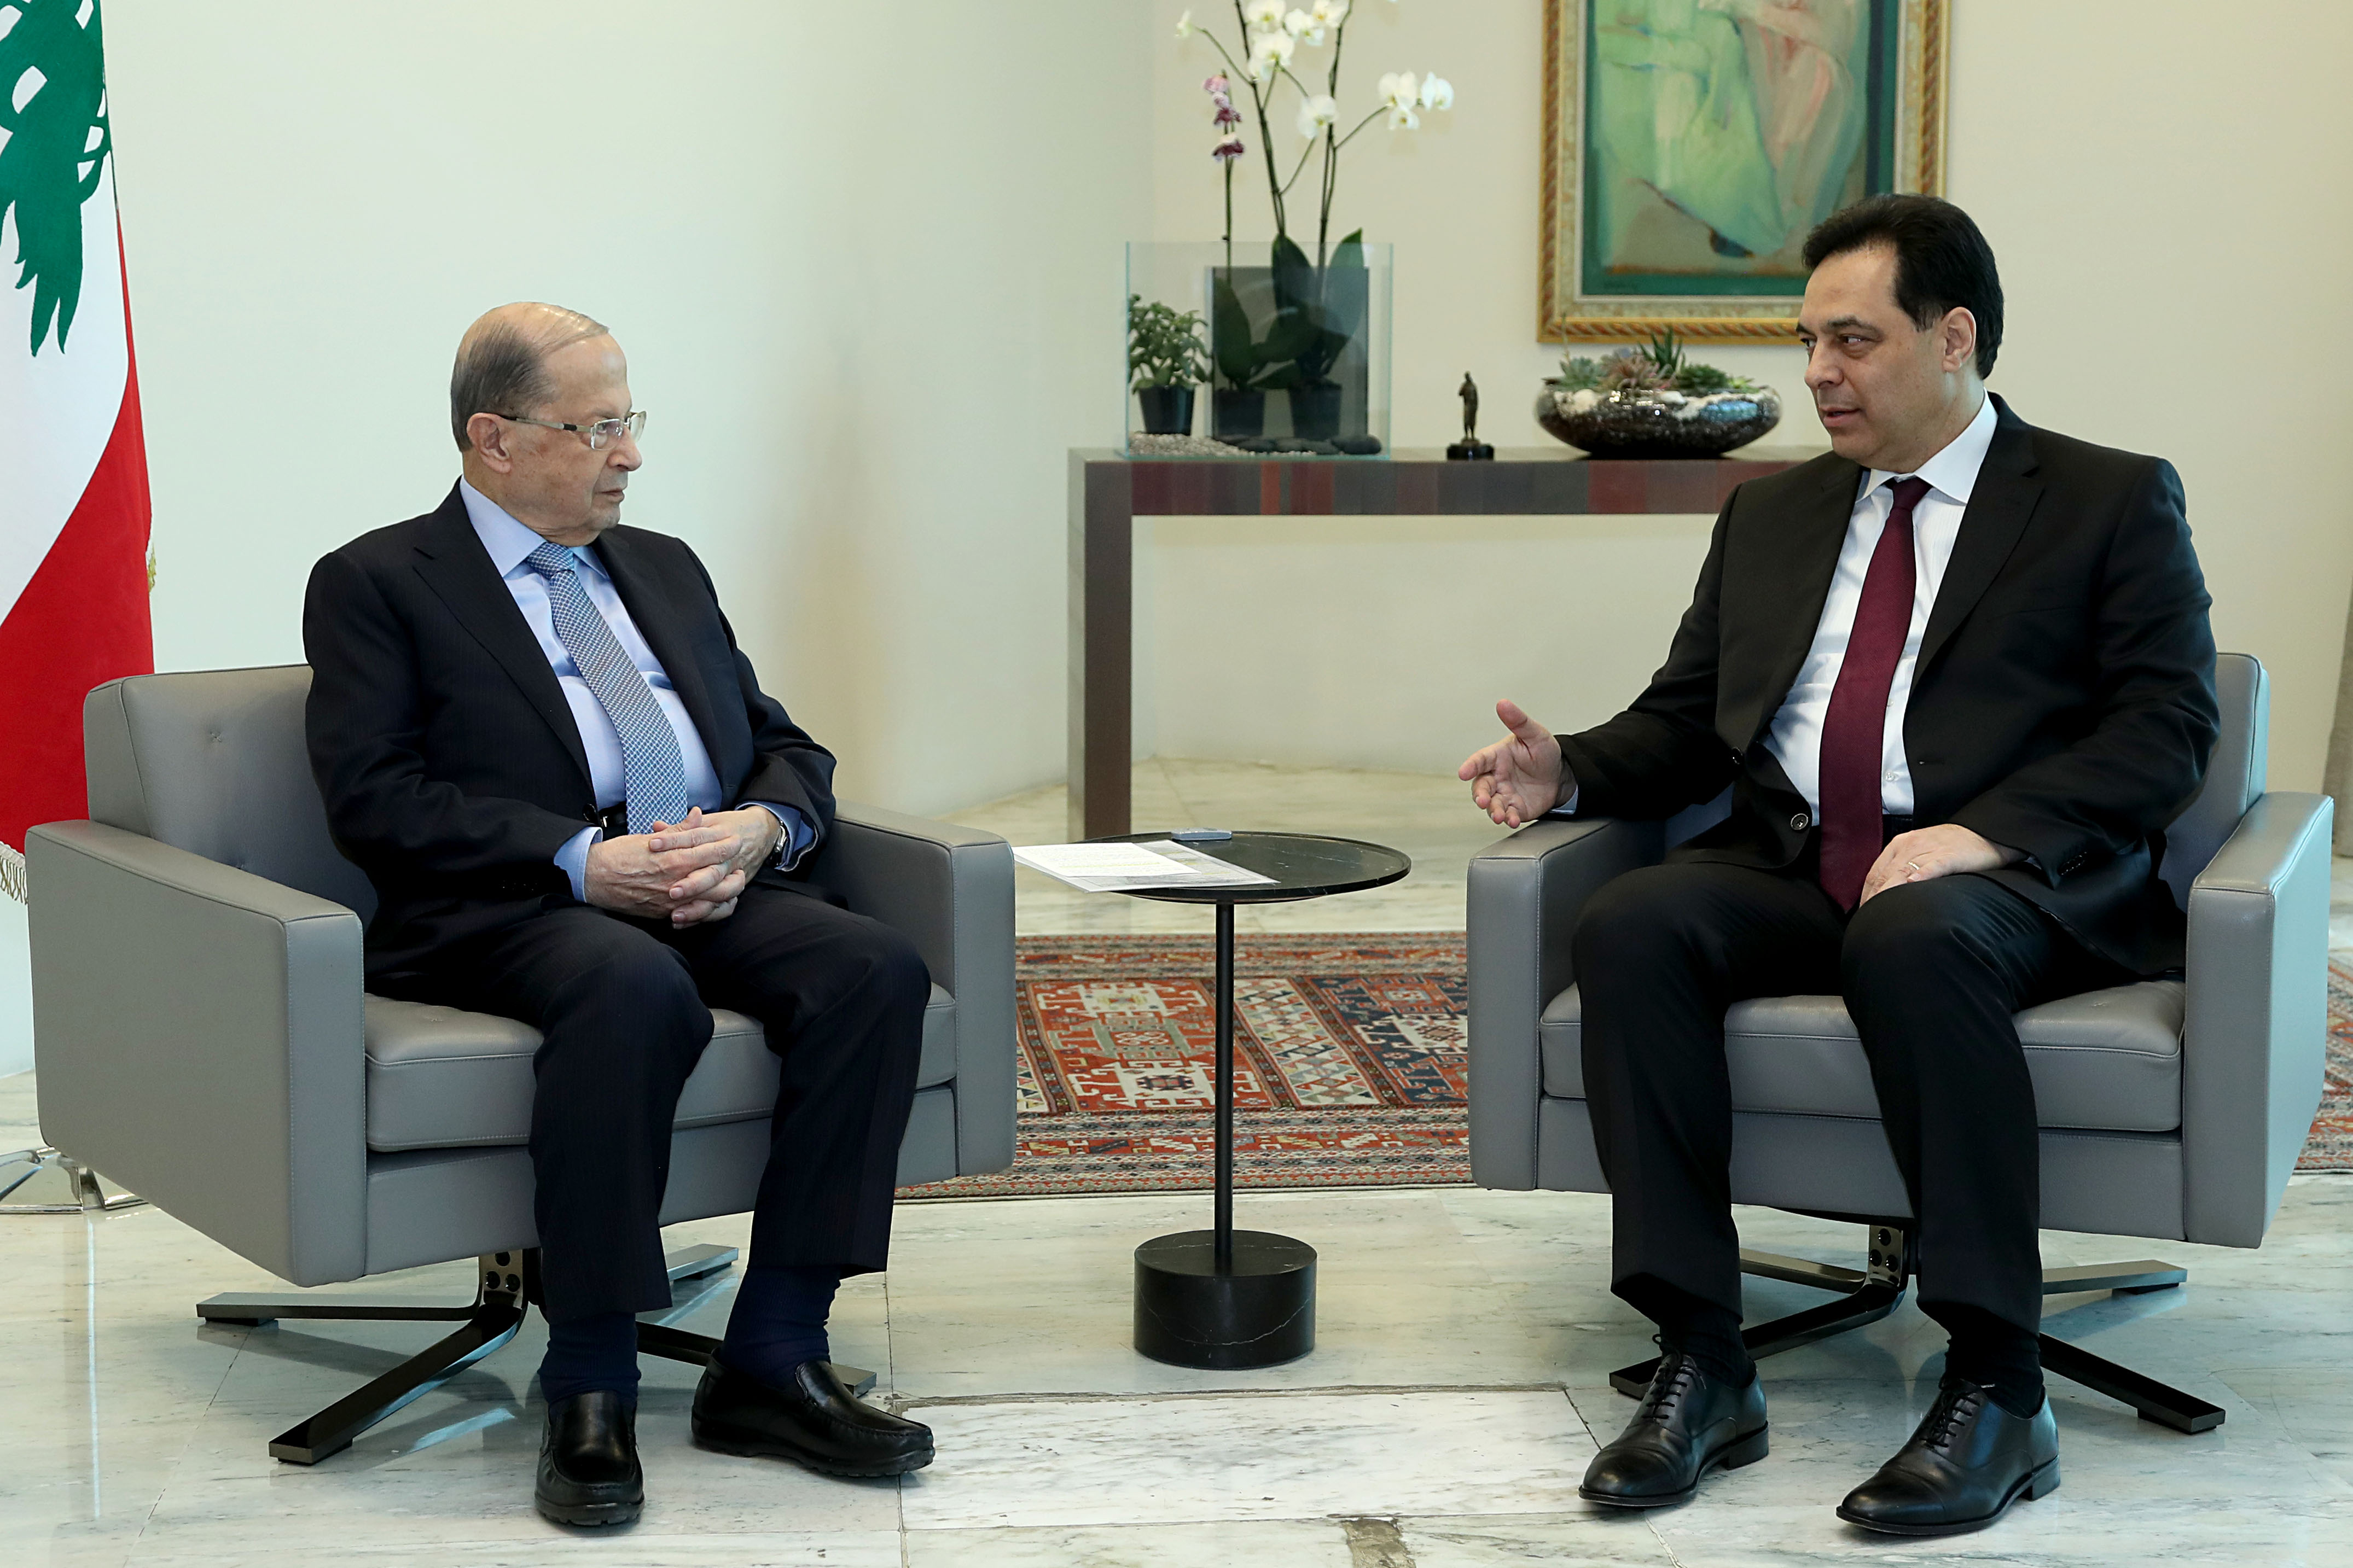 2 -Prime Minister Dr. Hassan Diab